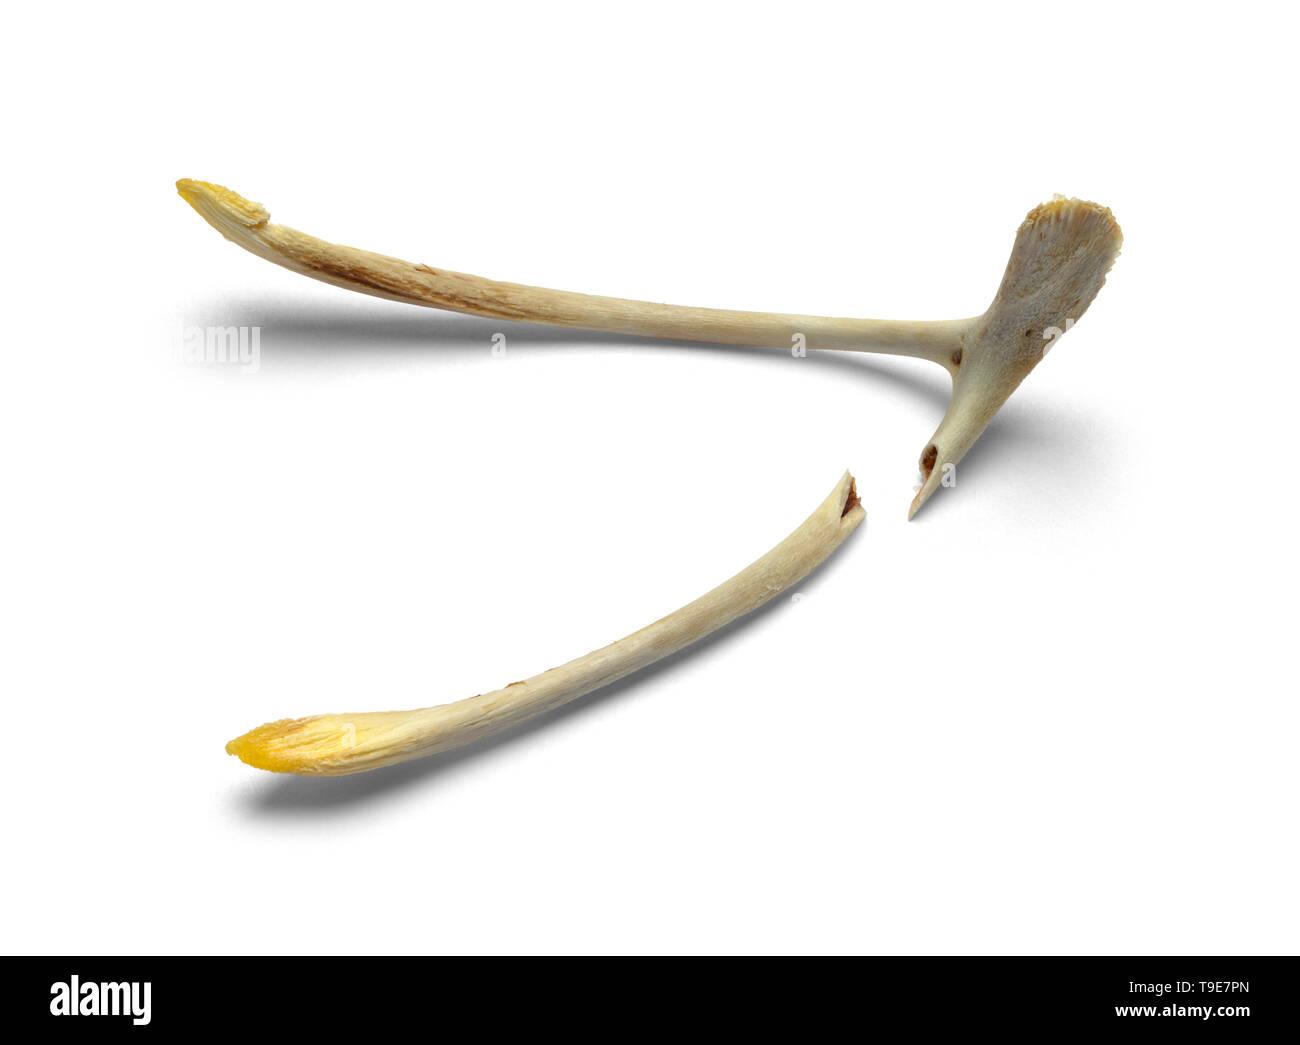 Wish Bone Stock Photos & Wish Bone Stock Images - Alamy